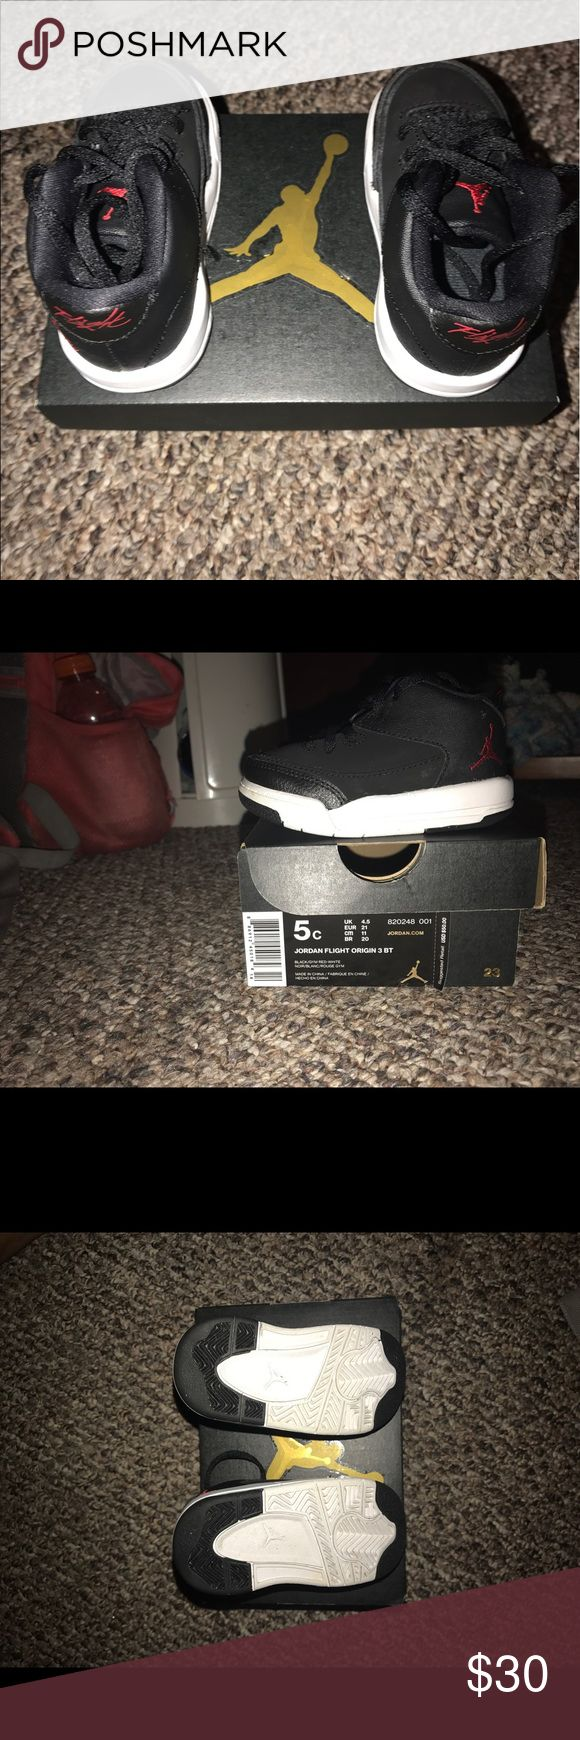 Cheaper Nike Jordan Aero Mania 2013 Cheap sale Gym Red White-Bri